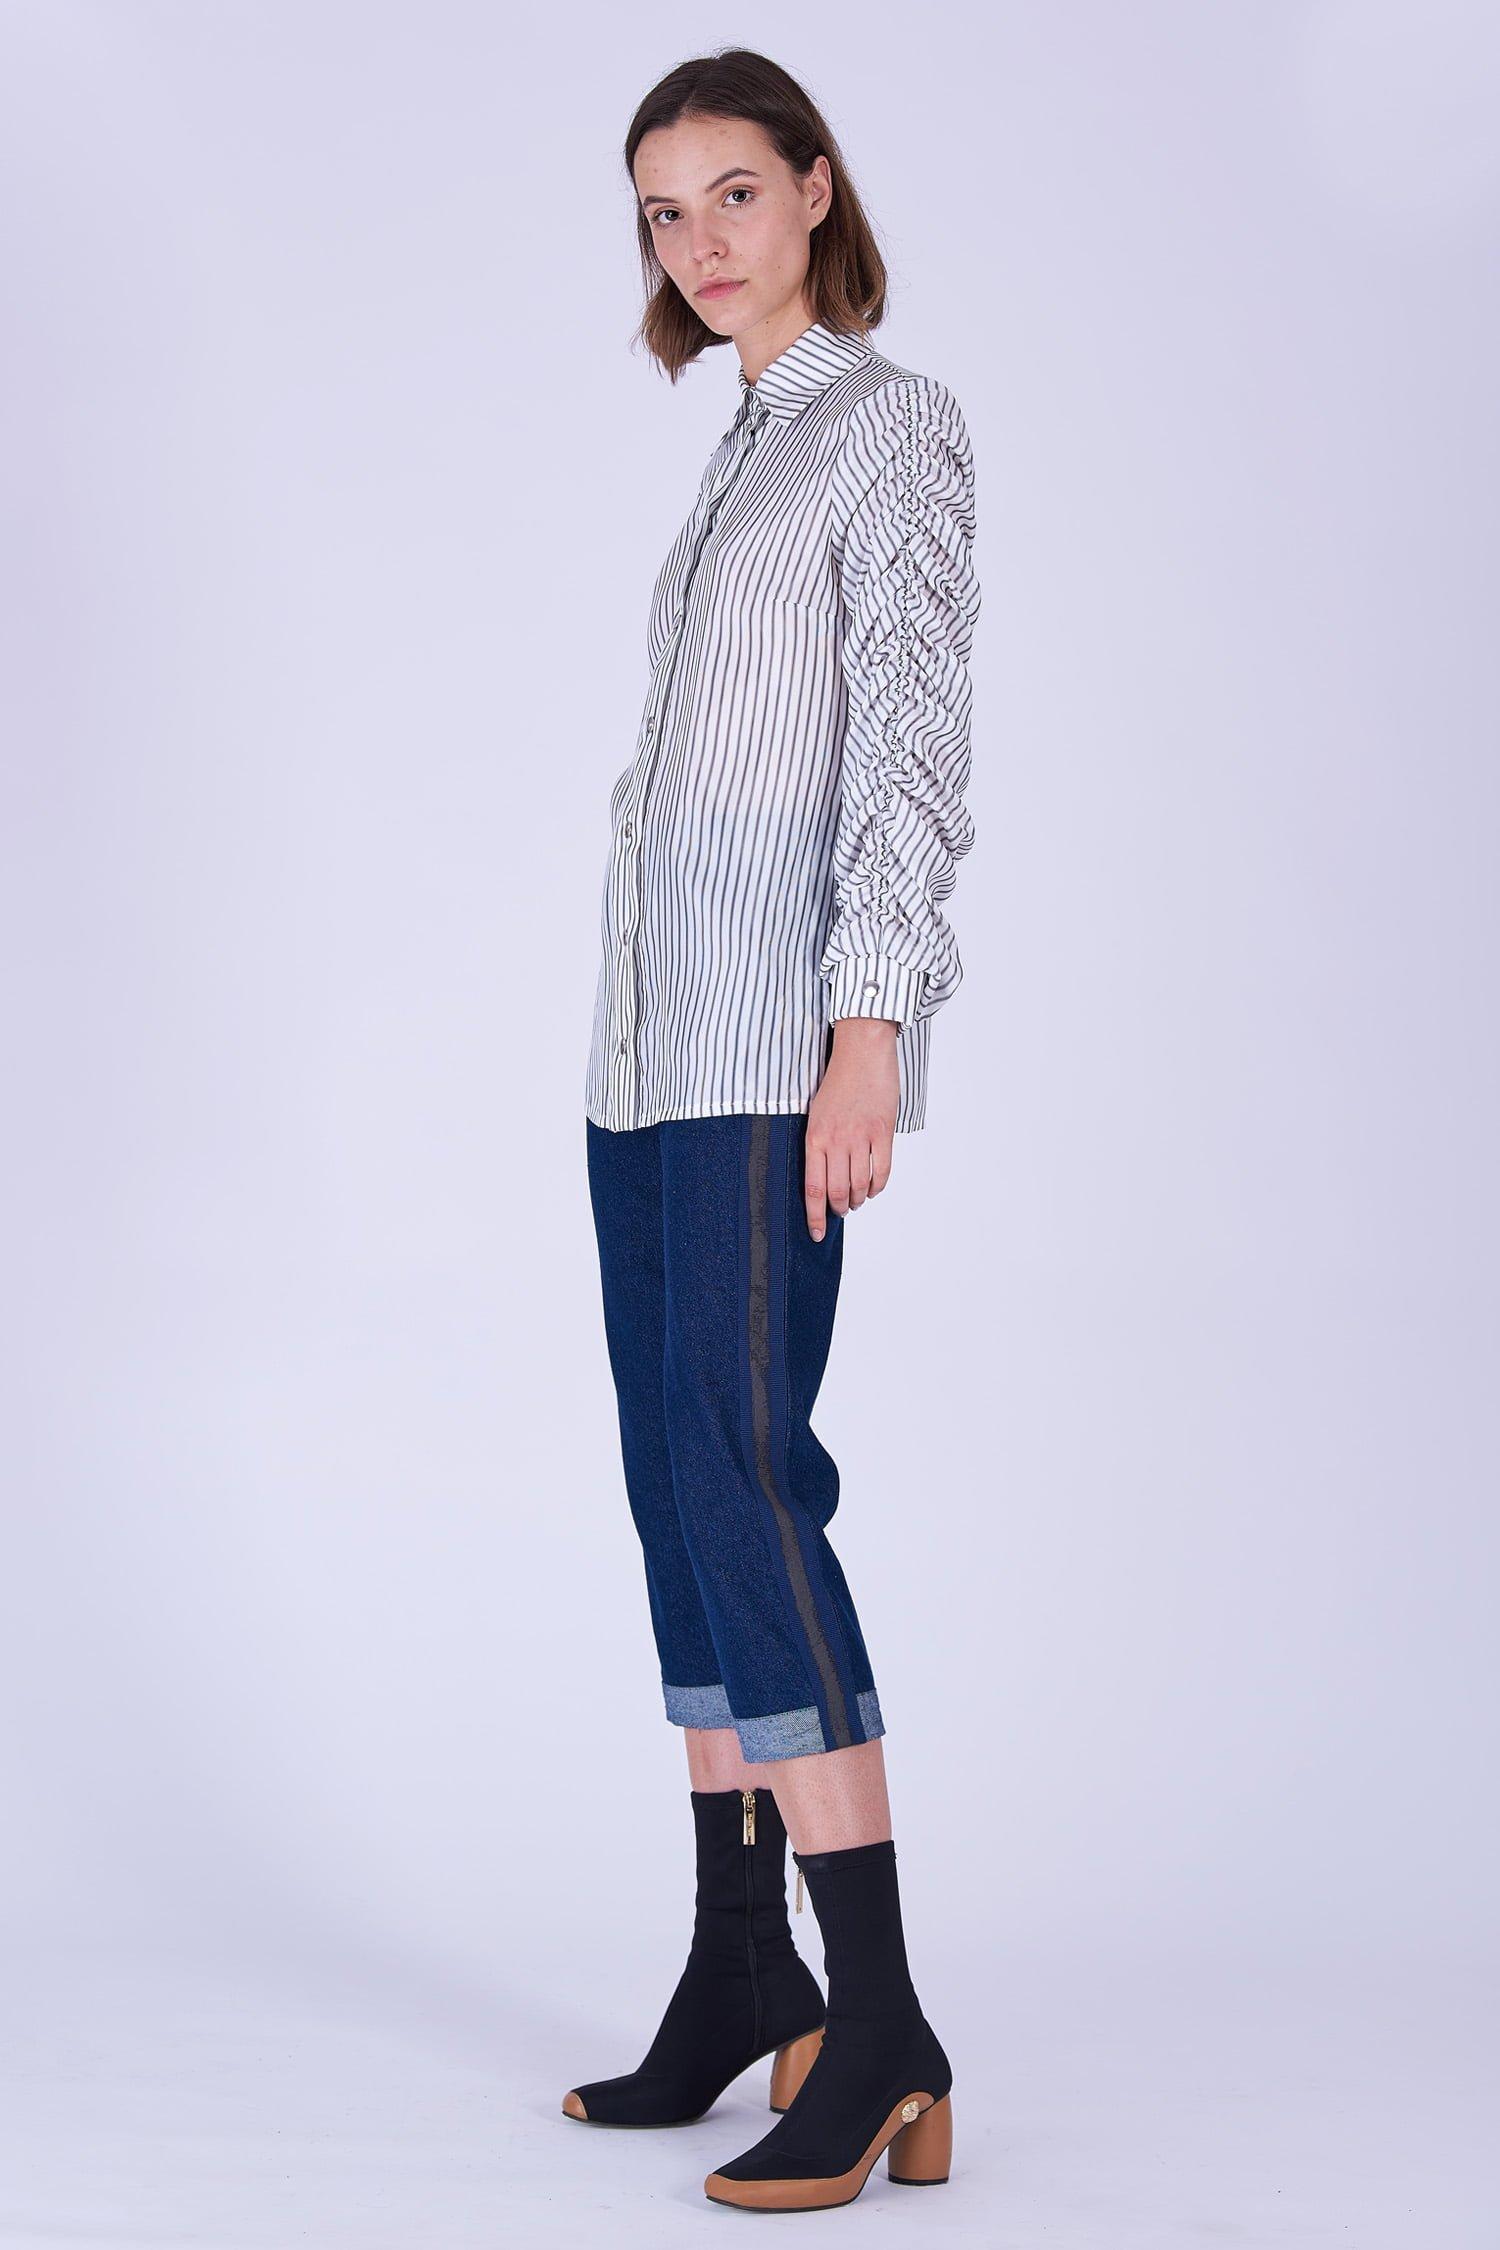 Acephala Fw19 20 White Striped Buttoned Shirt Biala Koszula Paski Side 1